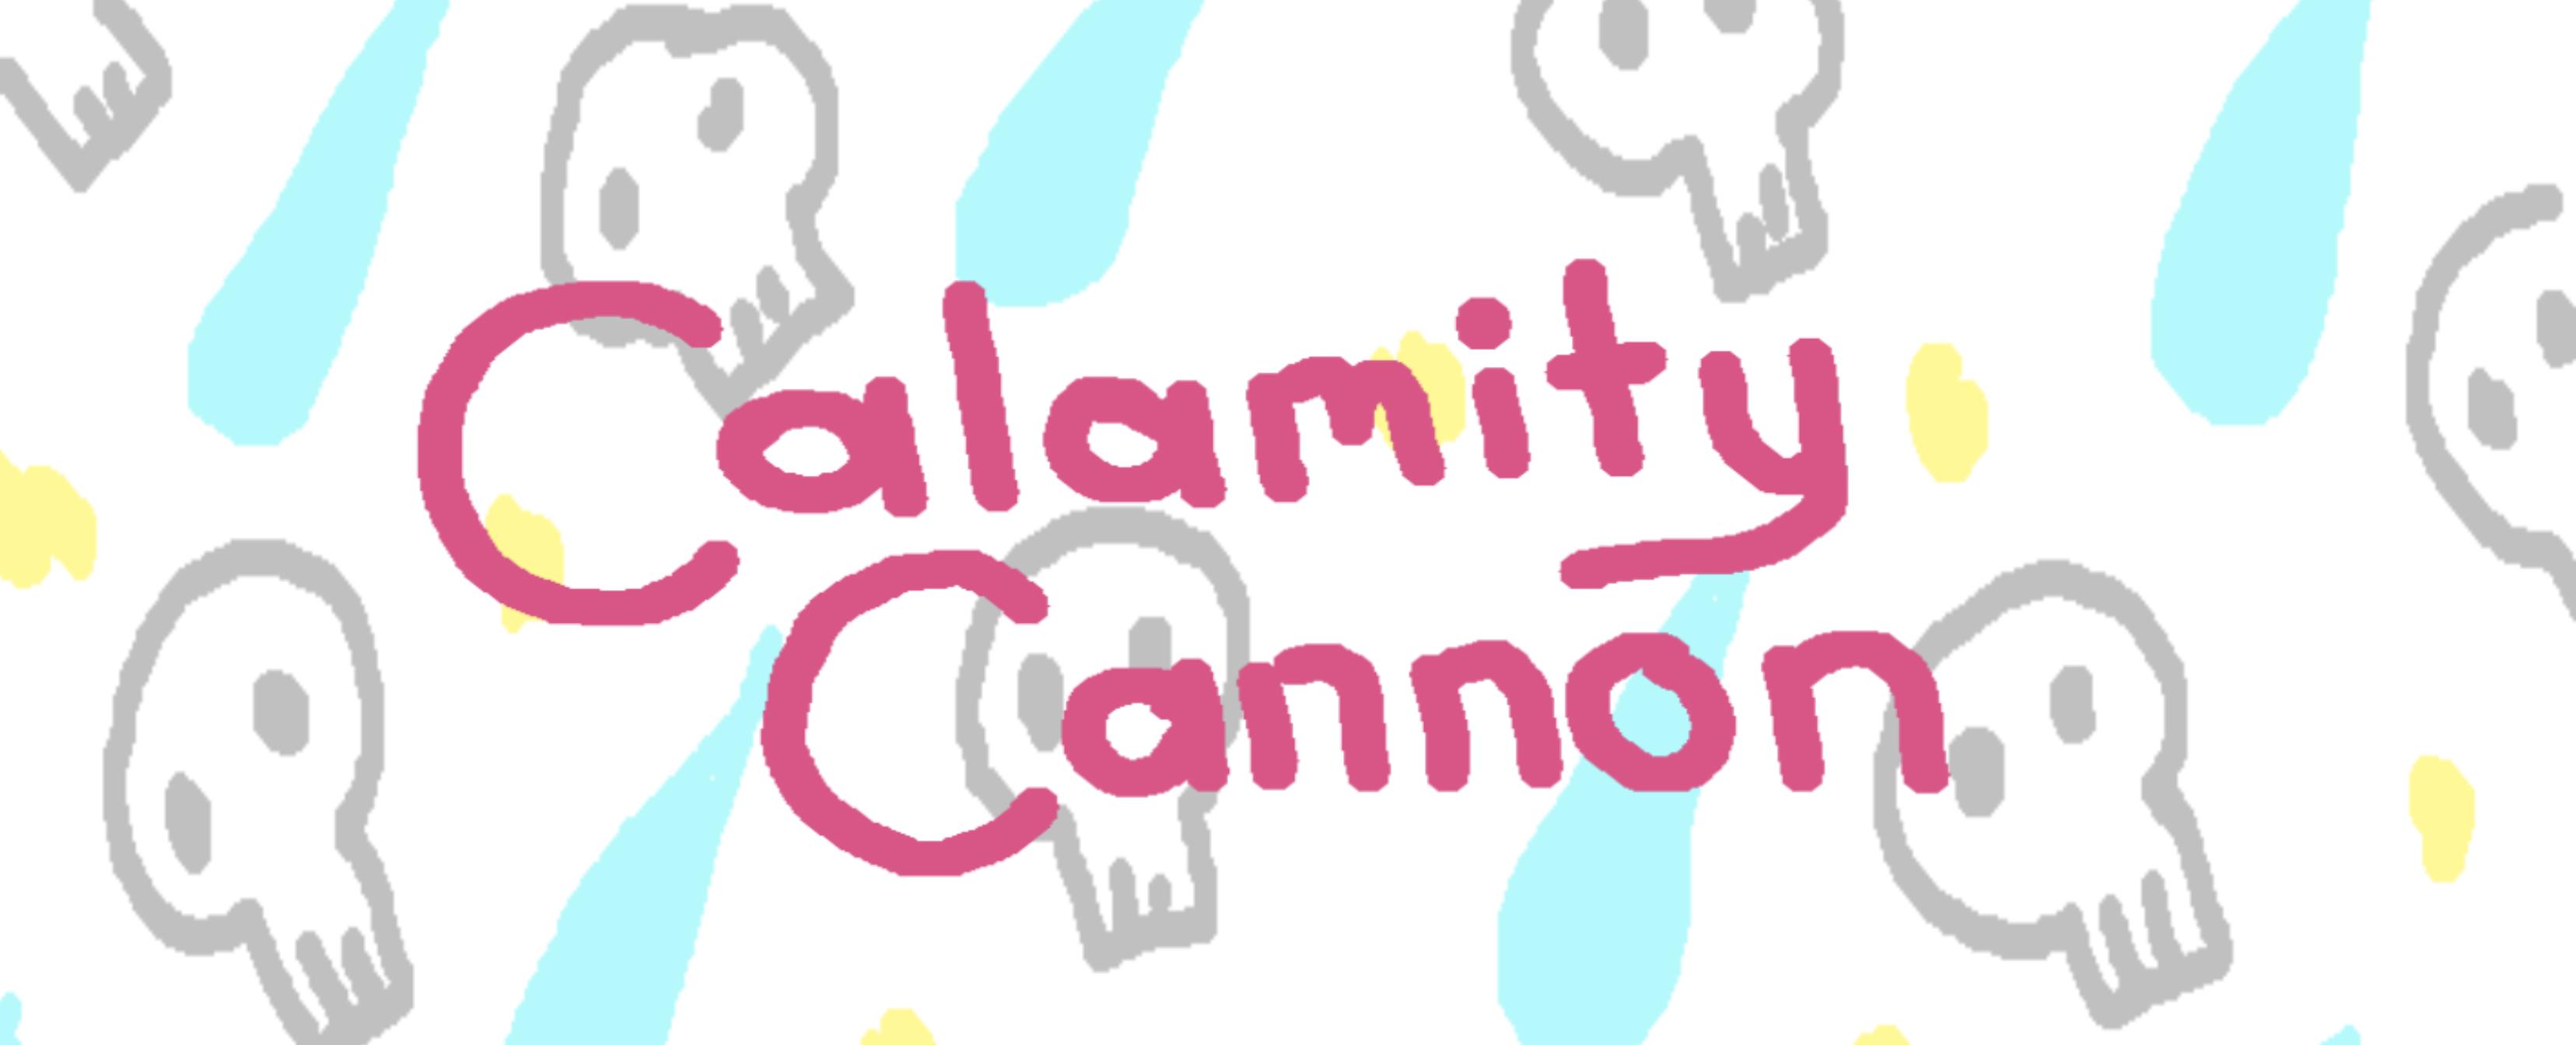 Calamity Cannon